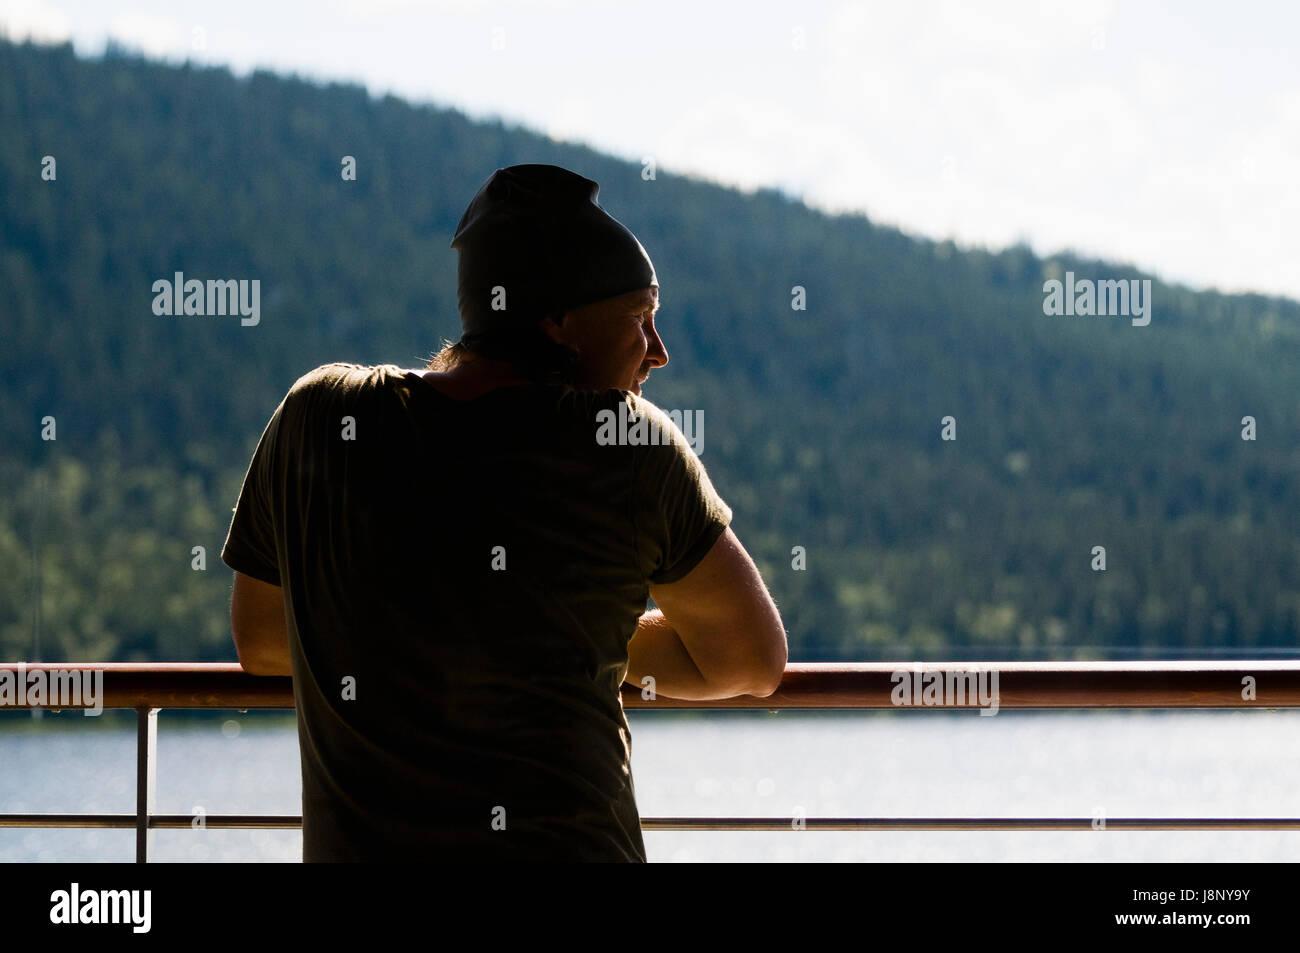 Man leaning on railing Stock Photo